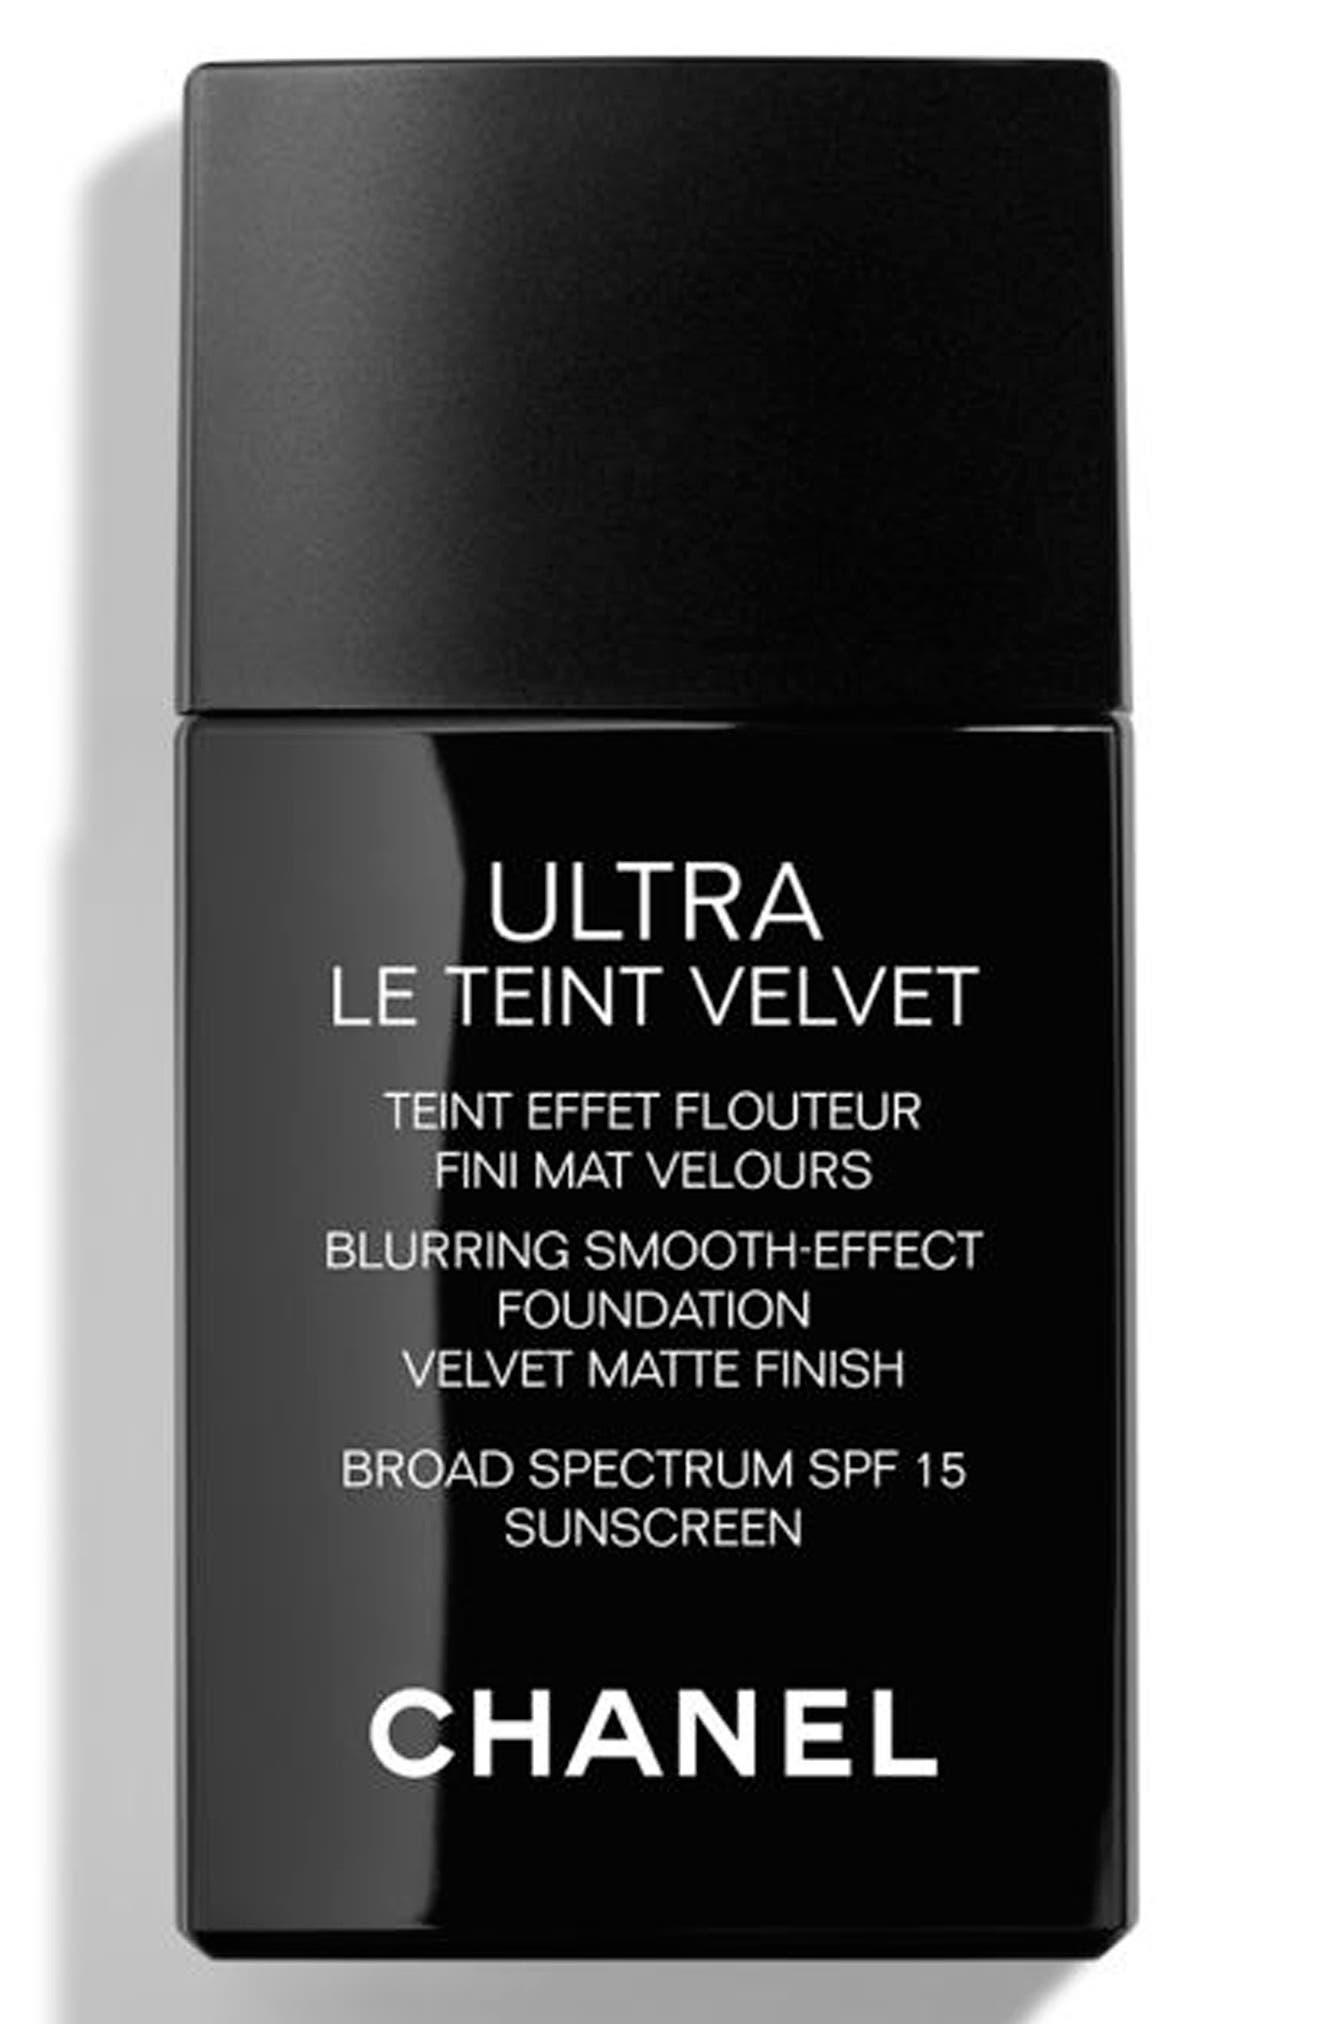 CHANEL ULTRA LE TEINT Velvet Blurring Smooth-Effect Foundation SPF 15   Nordstrom